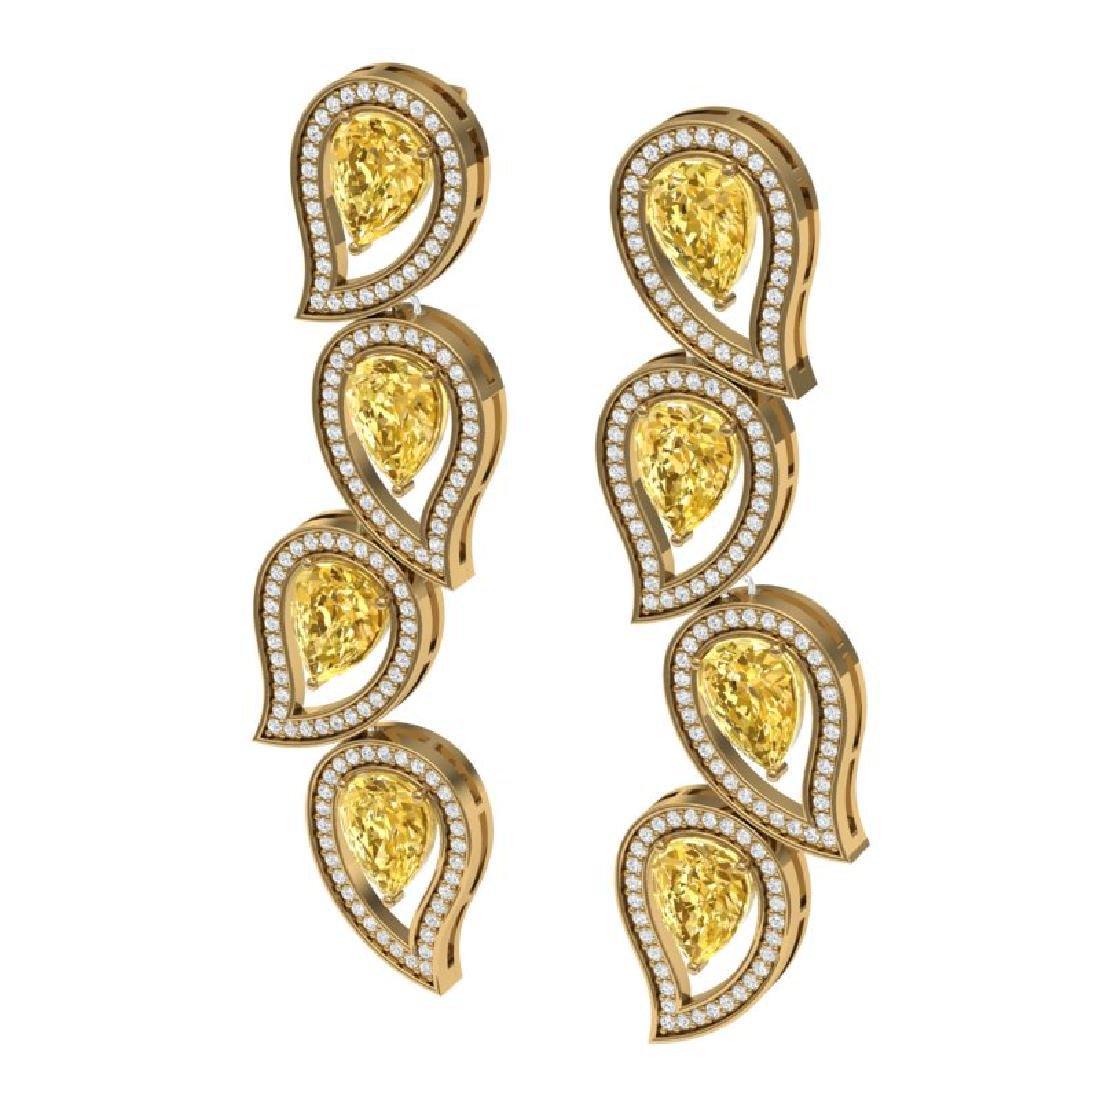 14.63 CTW Royalty Canary Citrine & VS Diamond Earrings - 2